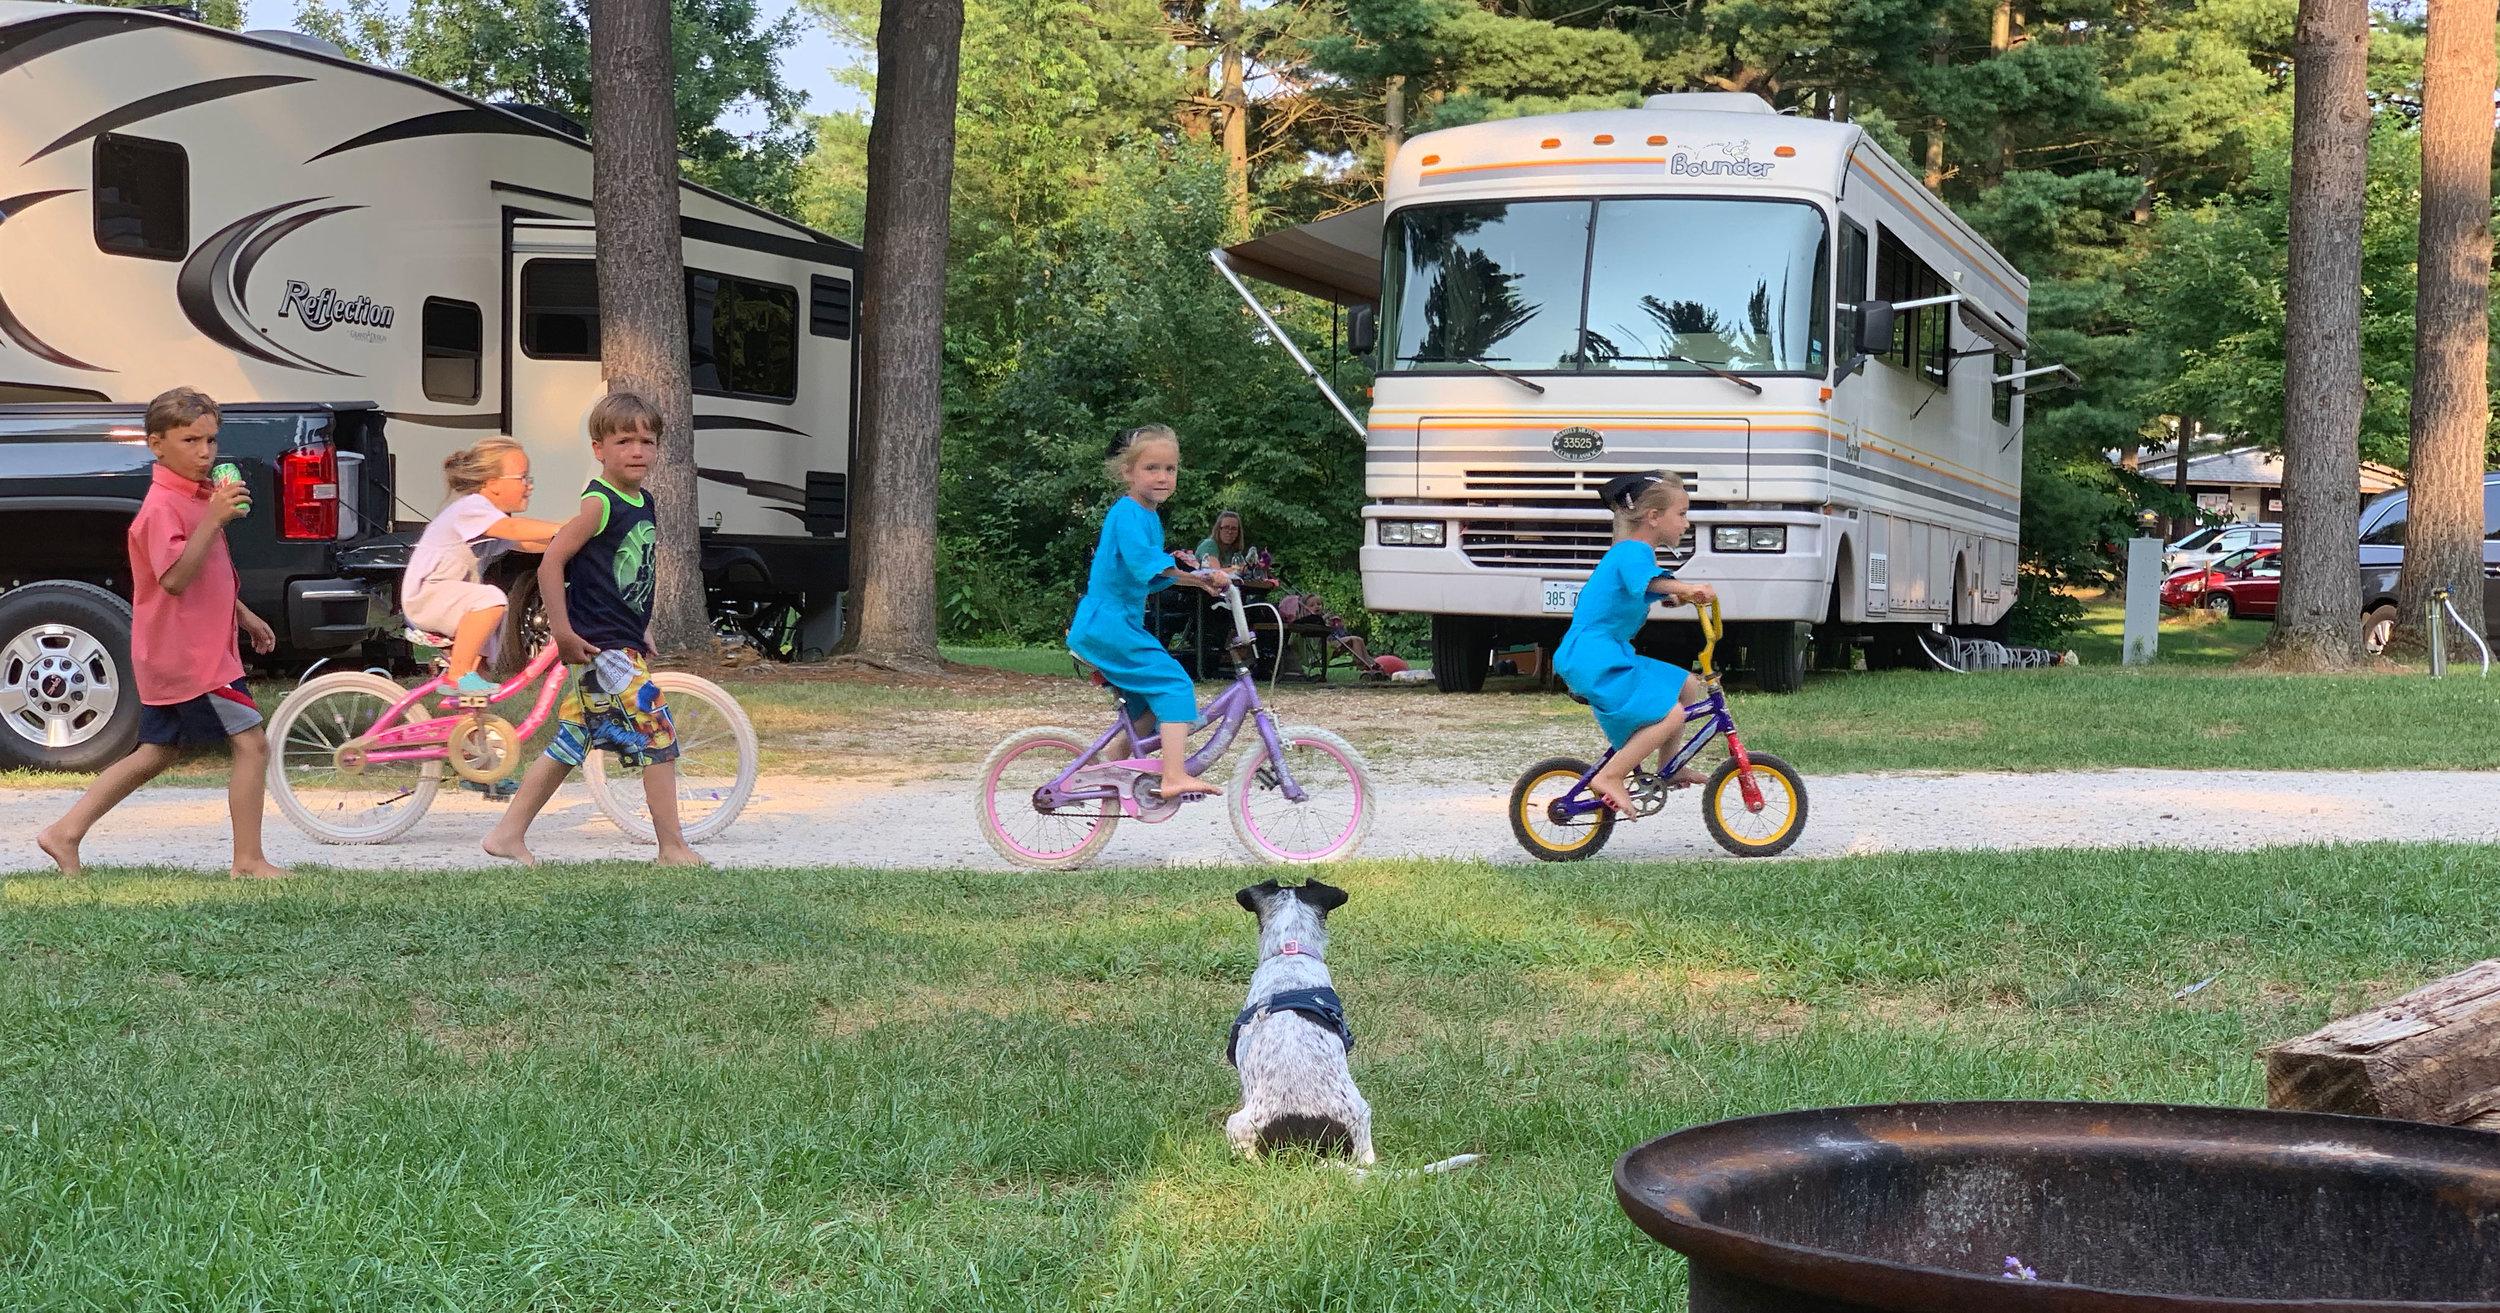 Amish kids on bikes.